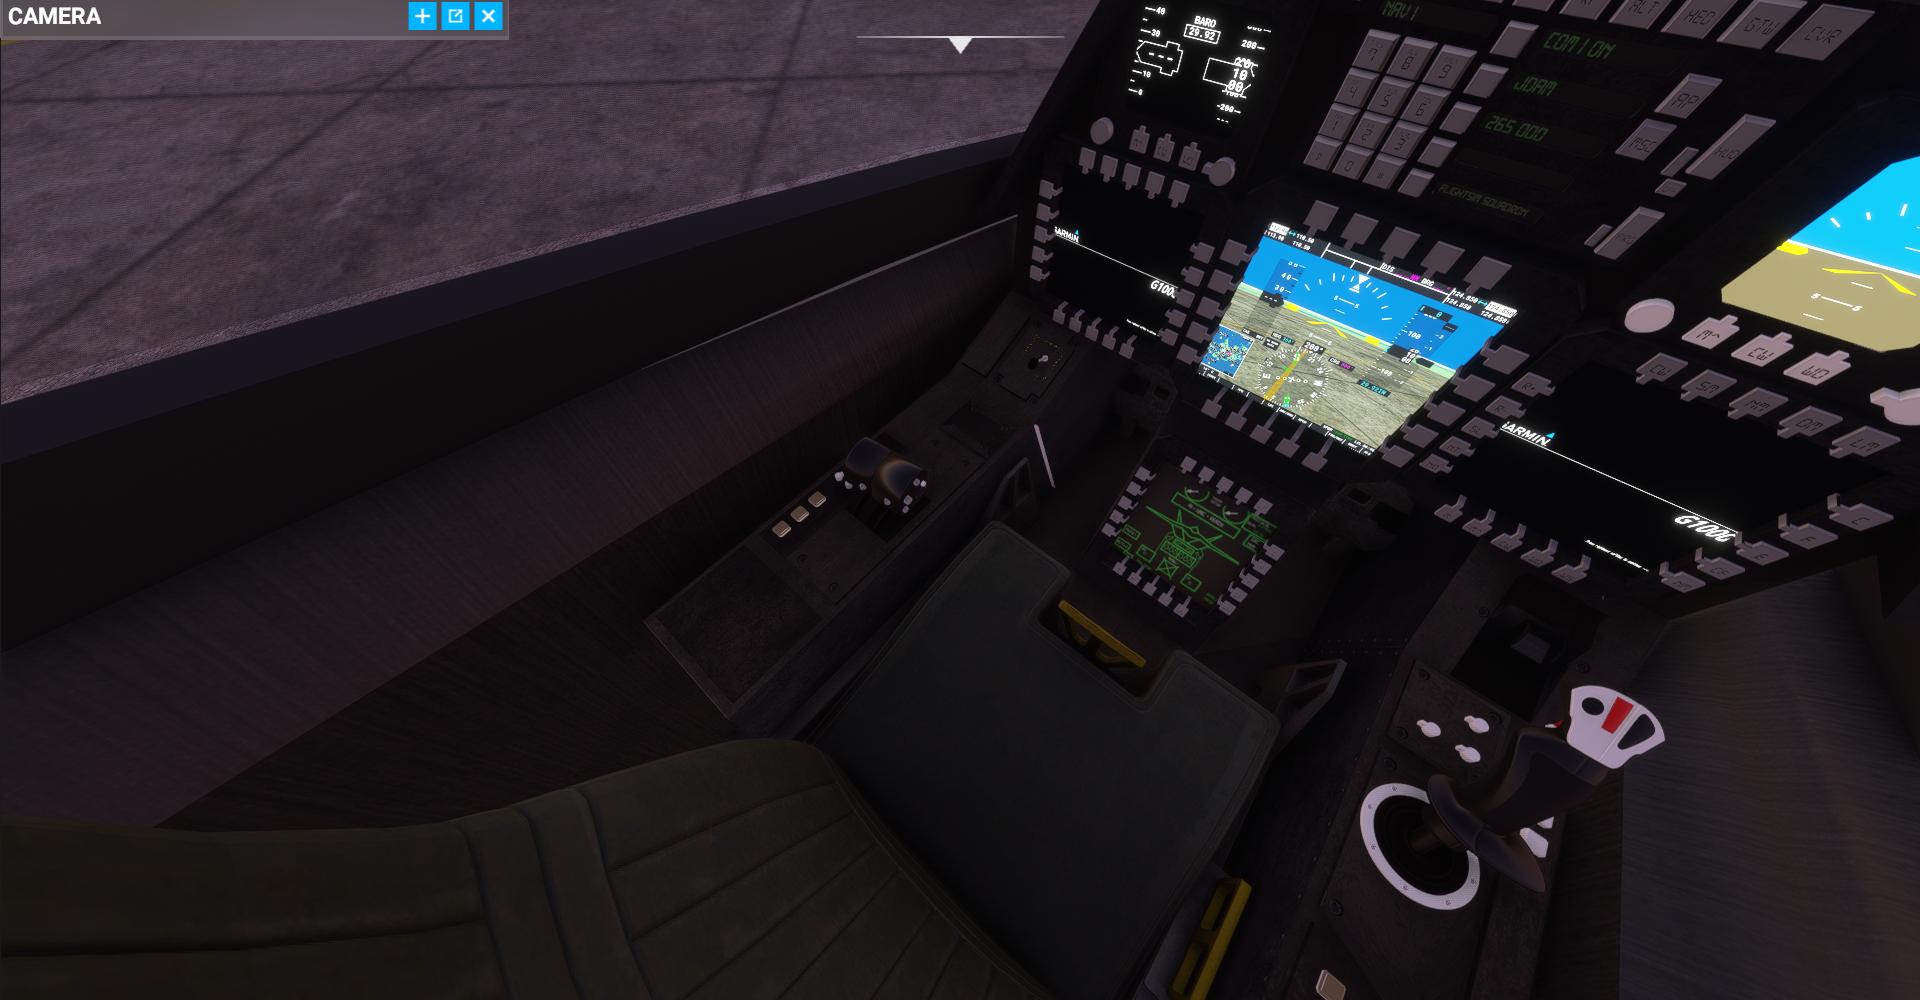 Desktop Screenshot 2021.03.02 - 01.03.52.33